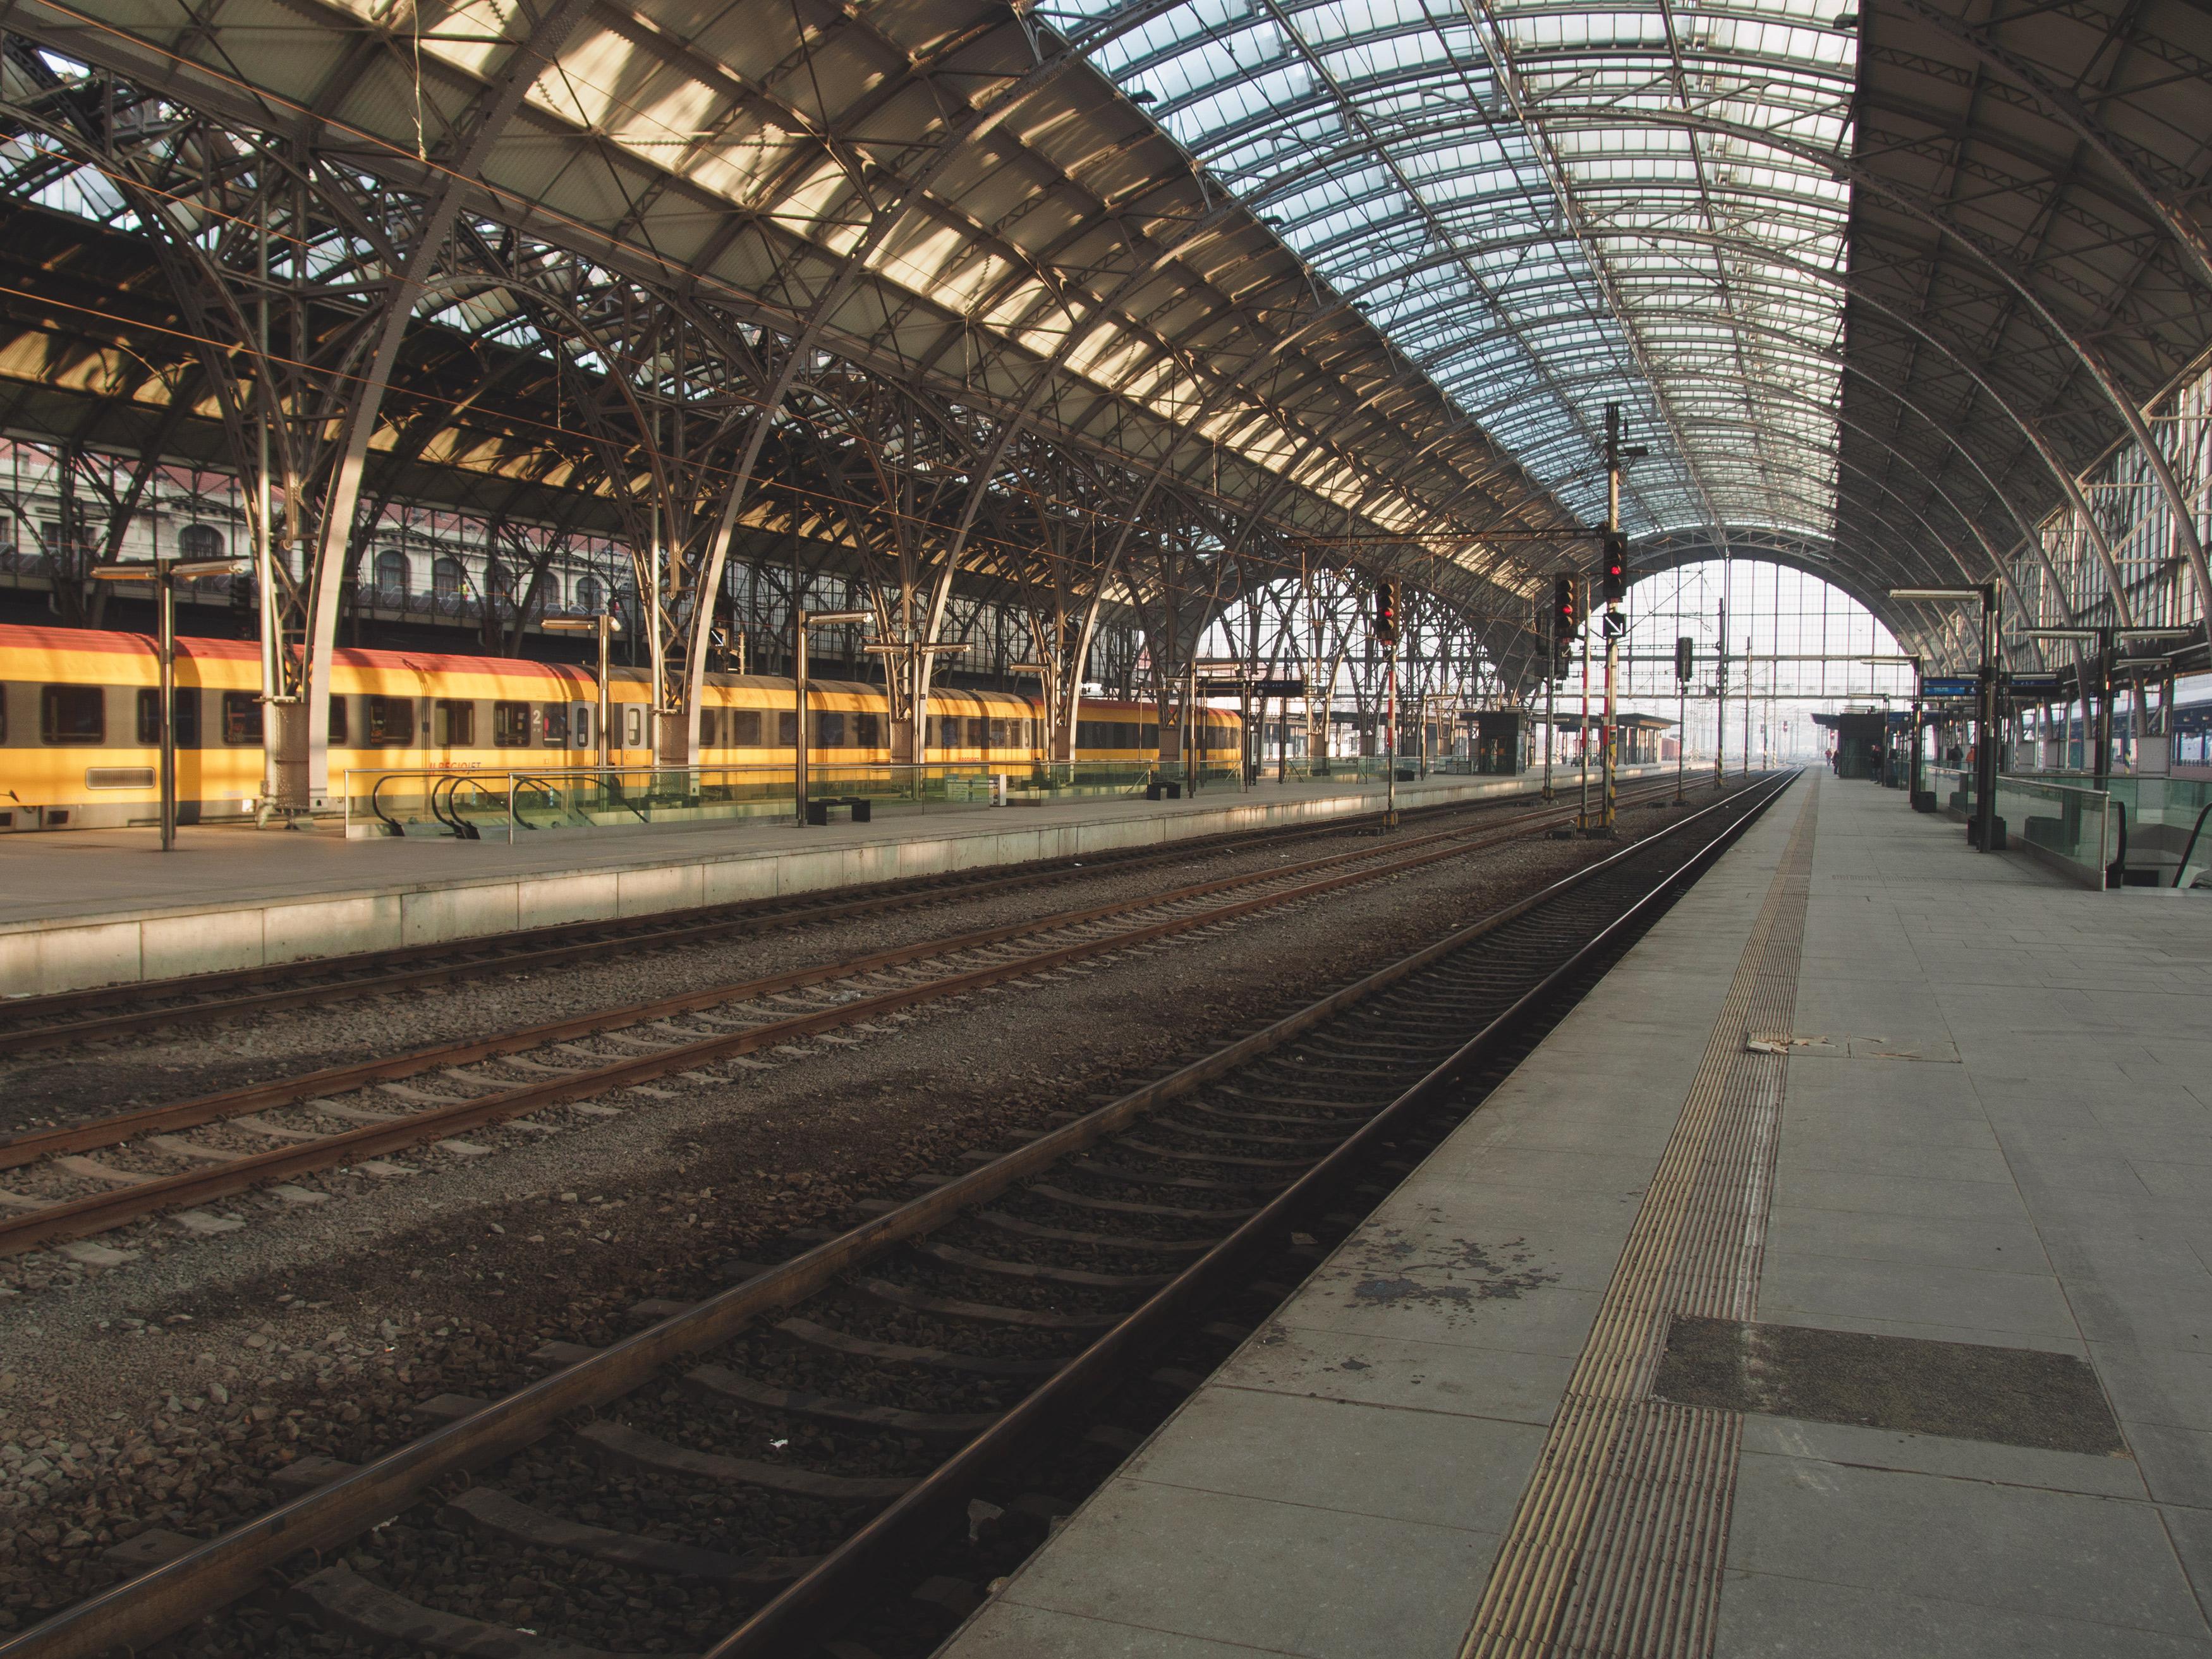 Free Image: Inside The Train Station | Libreshot Public Domain Photos